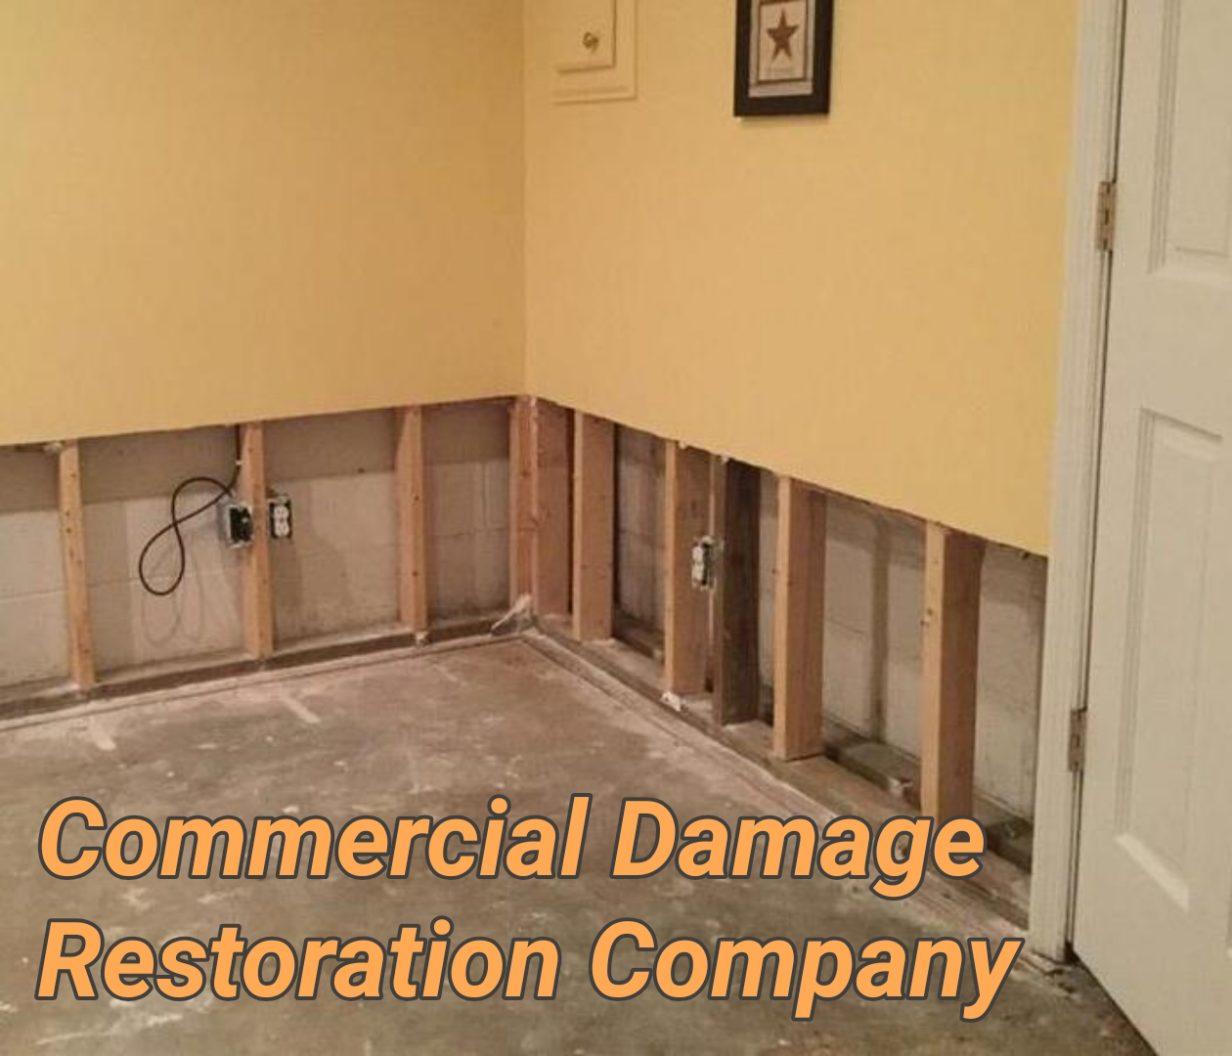 Commercial Damage Restoration Company